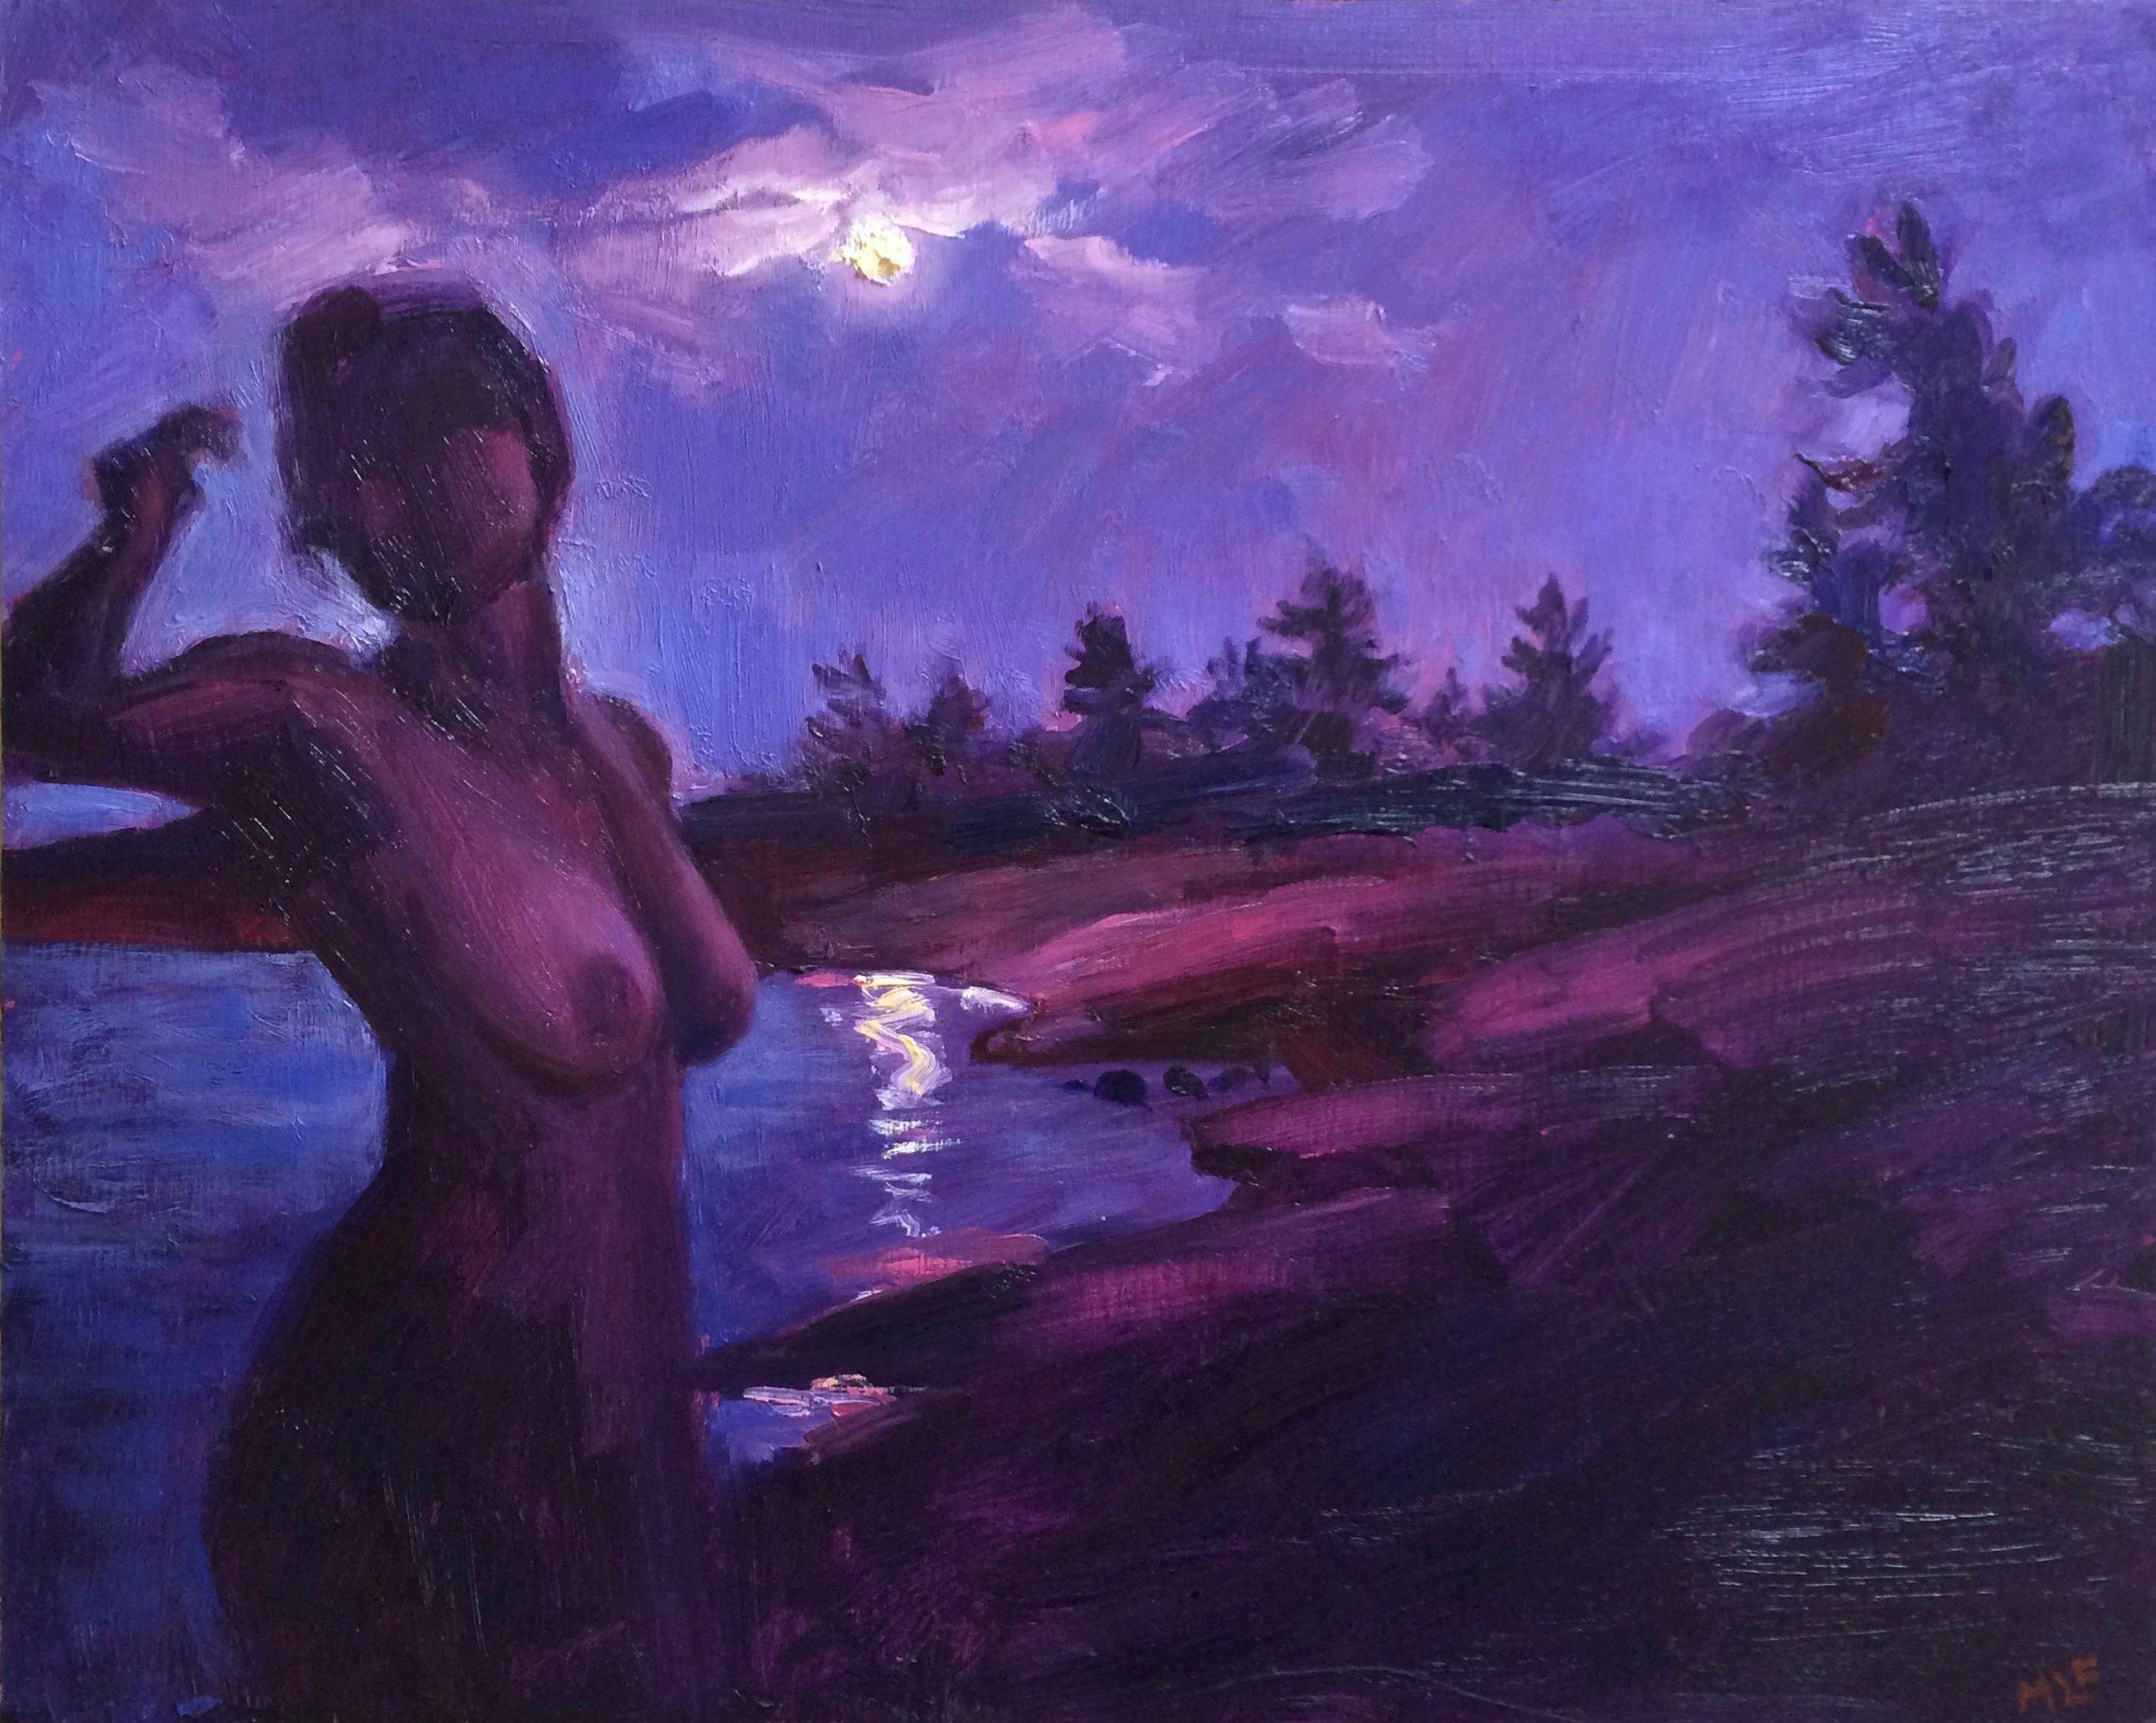 Spring Skinny Dip, Oil on Canvas, 16 x 20, SOLD